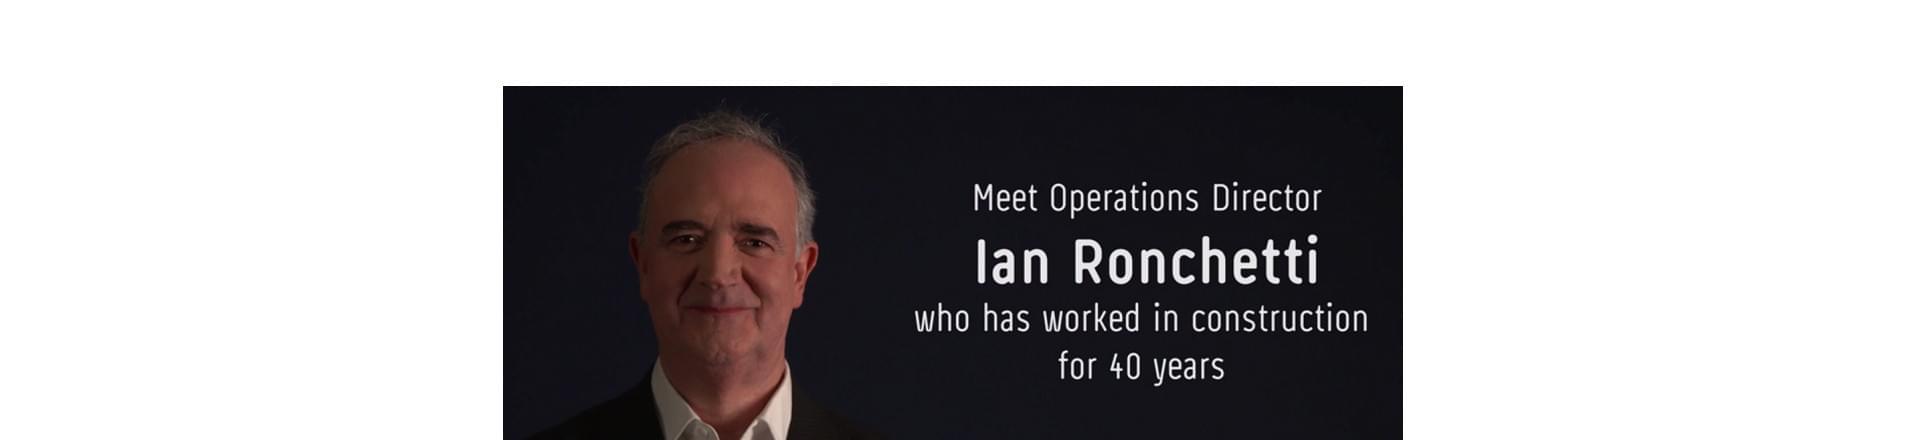 Ian Ronchetti